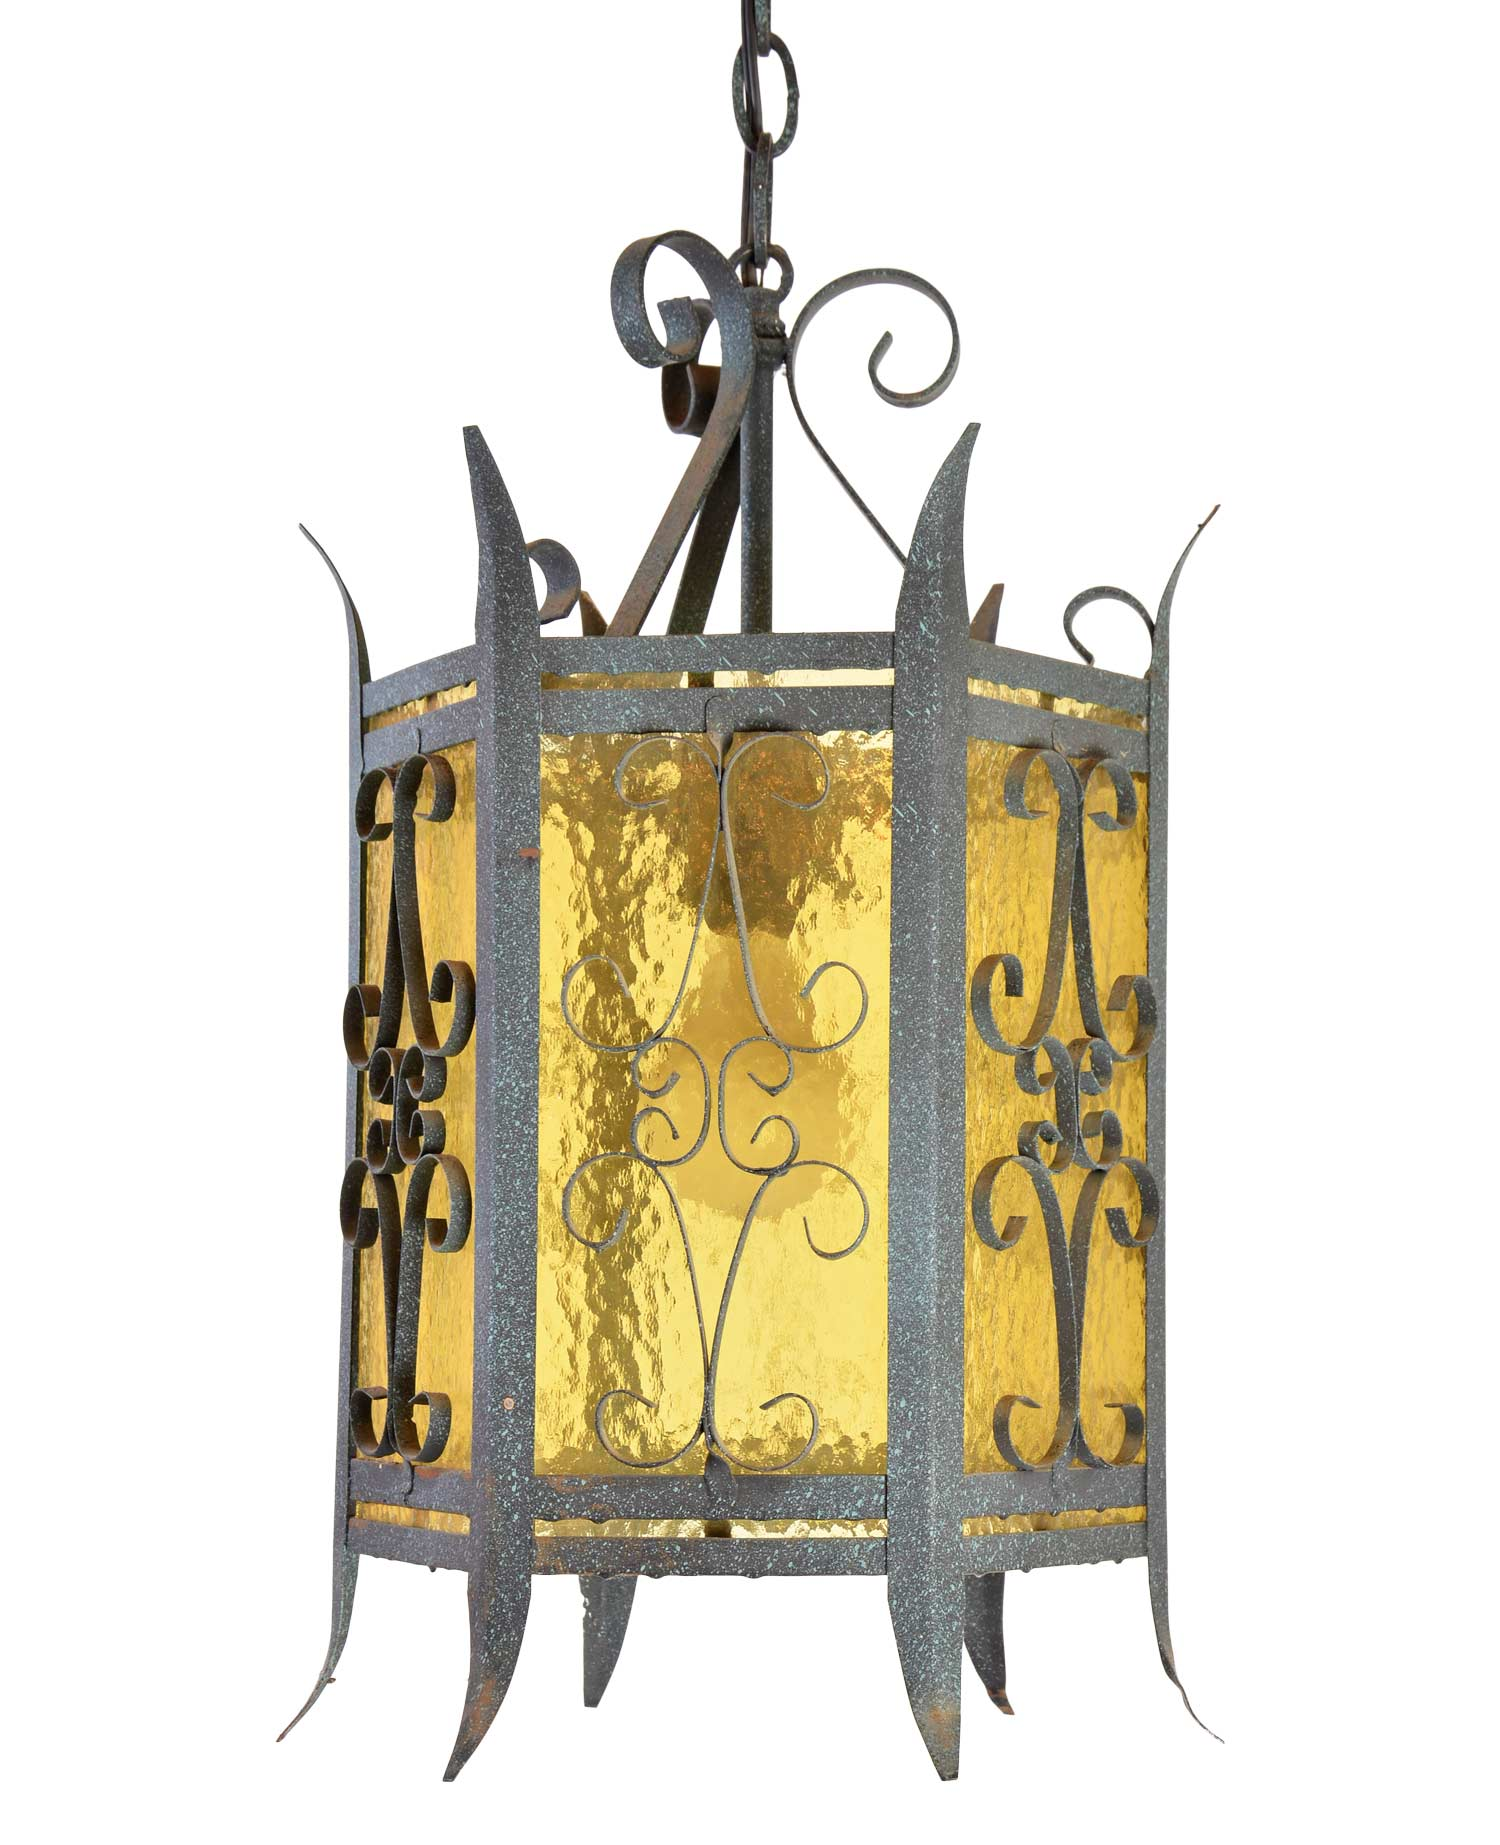 46371-steel-and-amber-glass-pendant-lantern-body.jpg